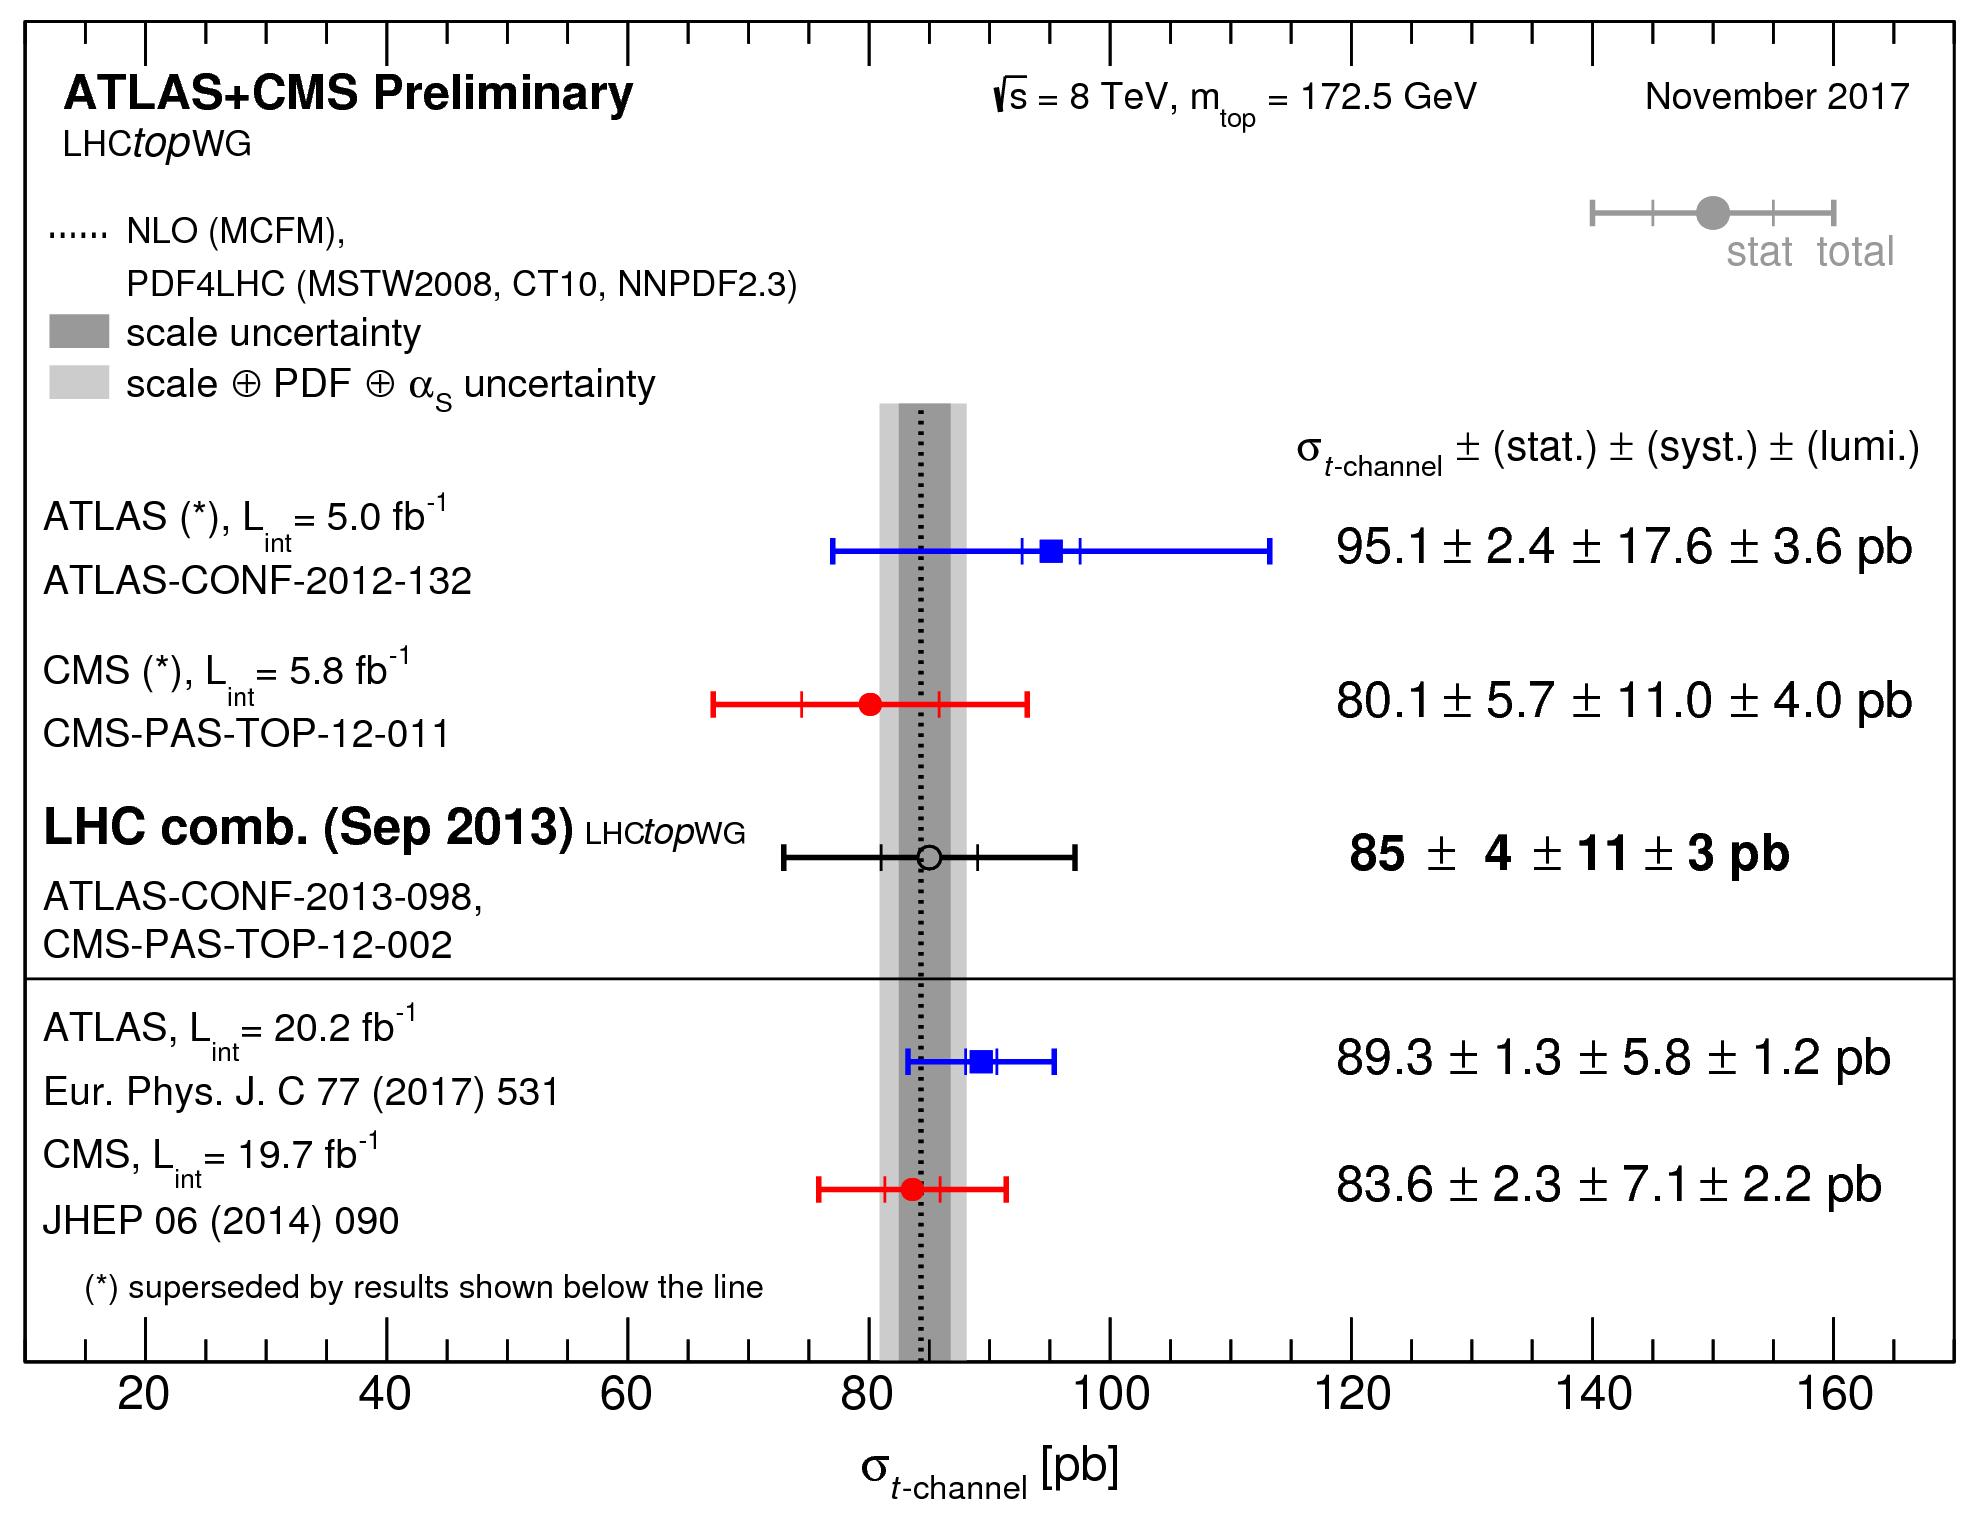 https://atlas.web.cern.ch/Atlas/GROUPS/PHYSICS/CombinedSummaryPlots/TOP/singletop_tchan_8TeV/singletop_tchan_8TeV.png